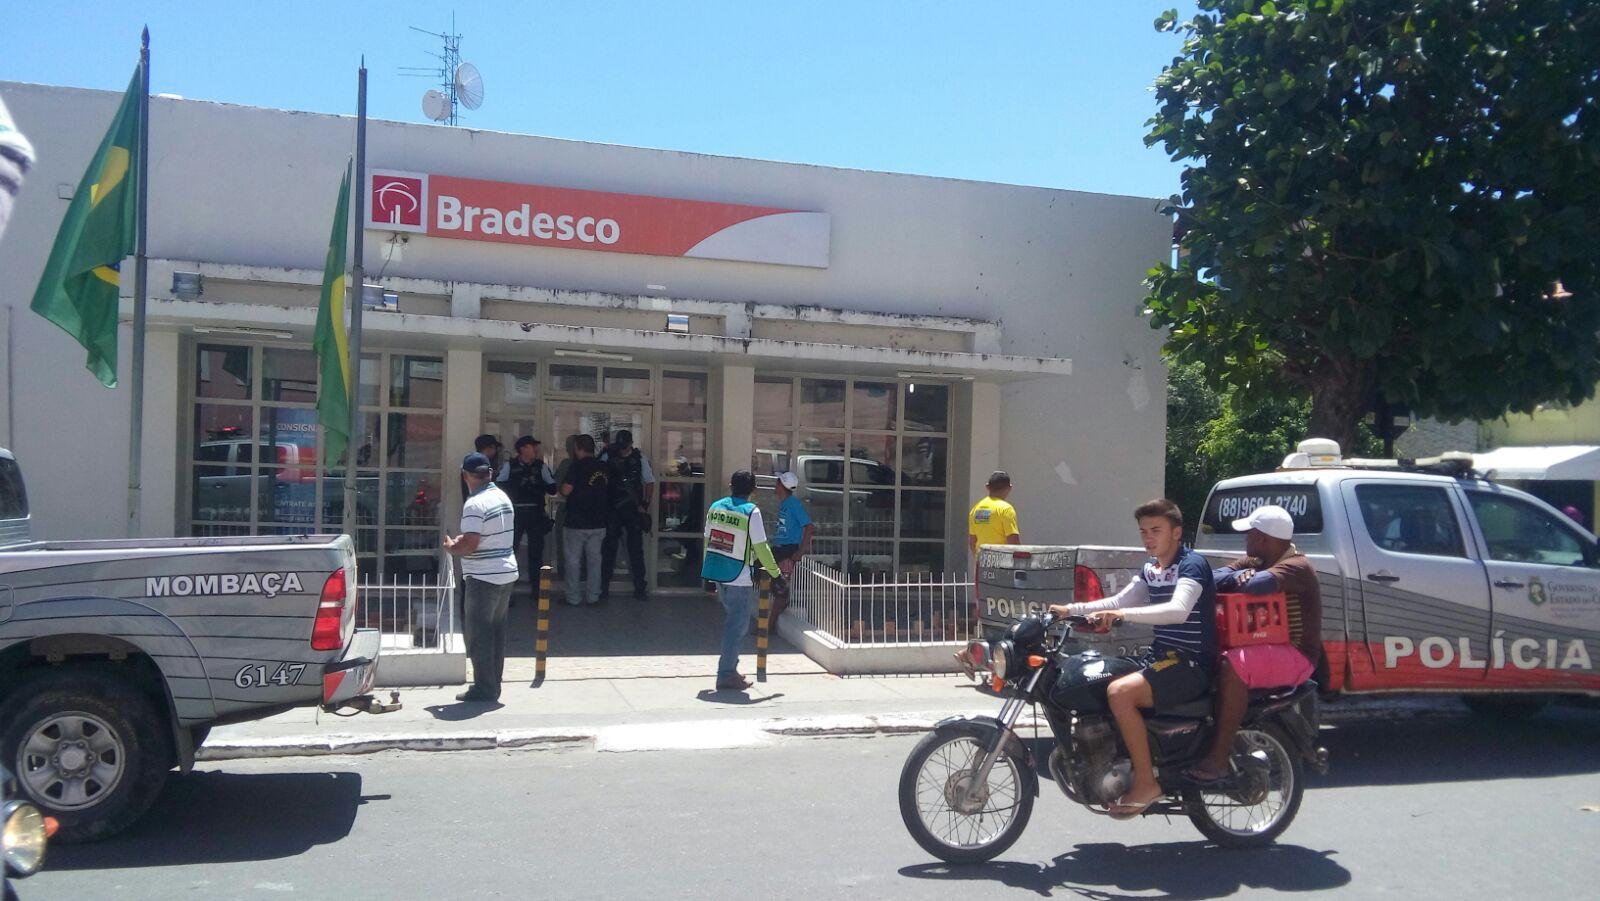 /home/tribu/public html/wp content/uploads/sites/2/2015/08/bradesco mombaca